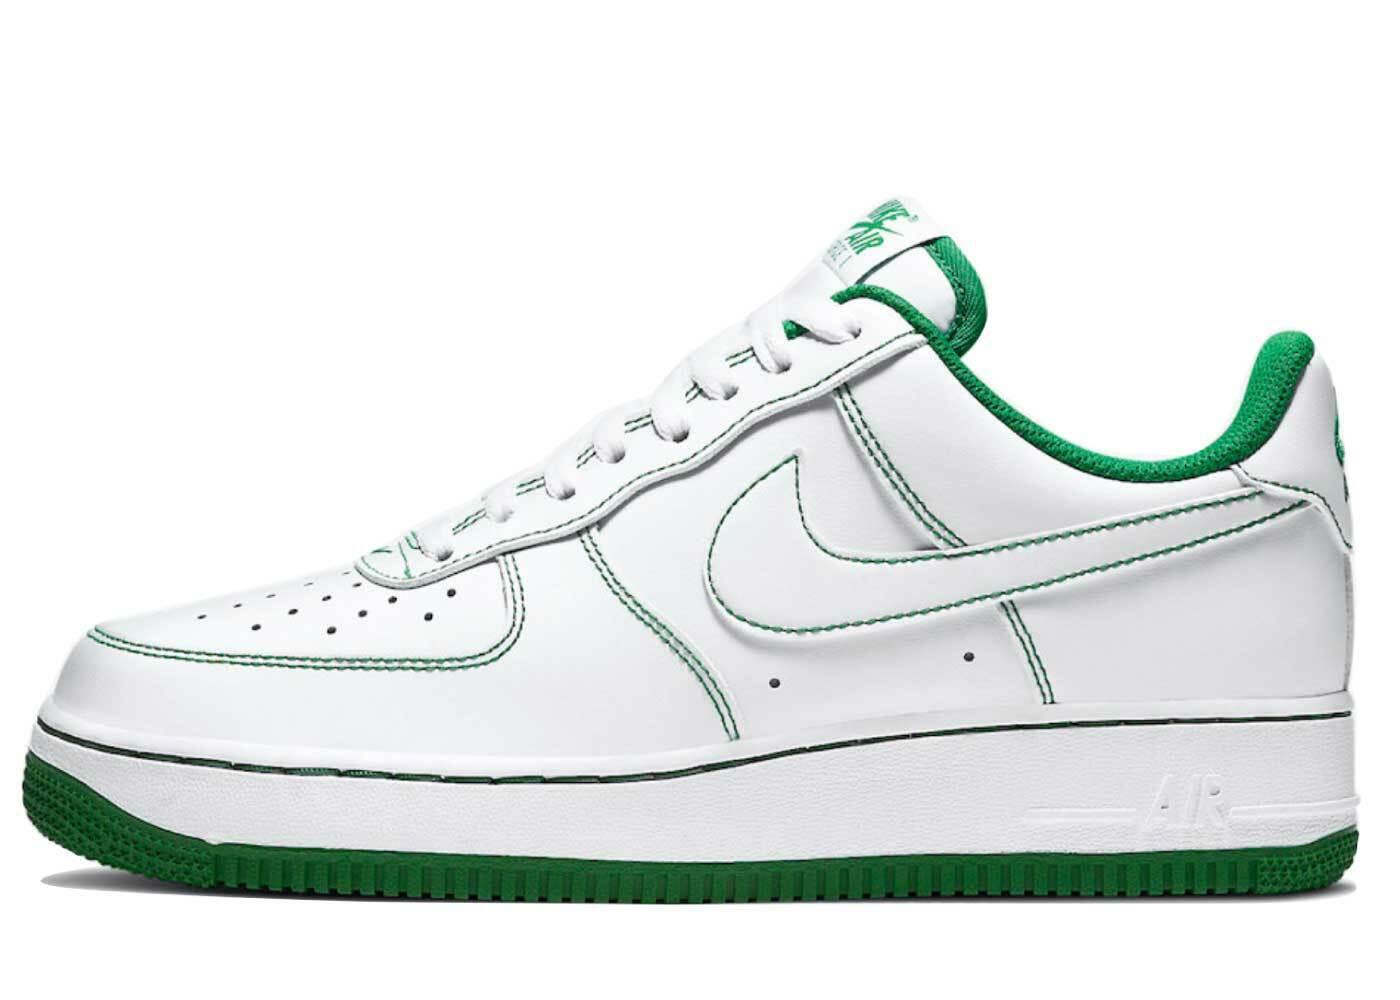 Nike Air Force 1 07 Low White Pine Greenの写真